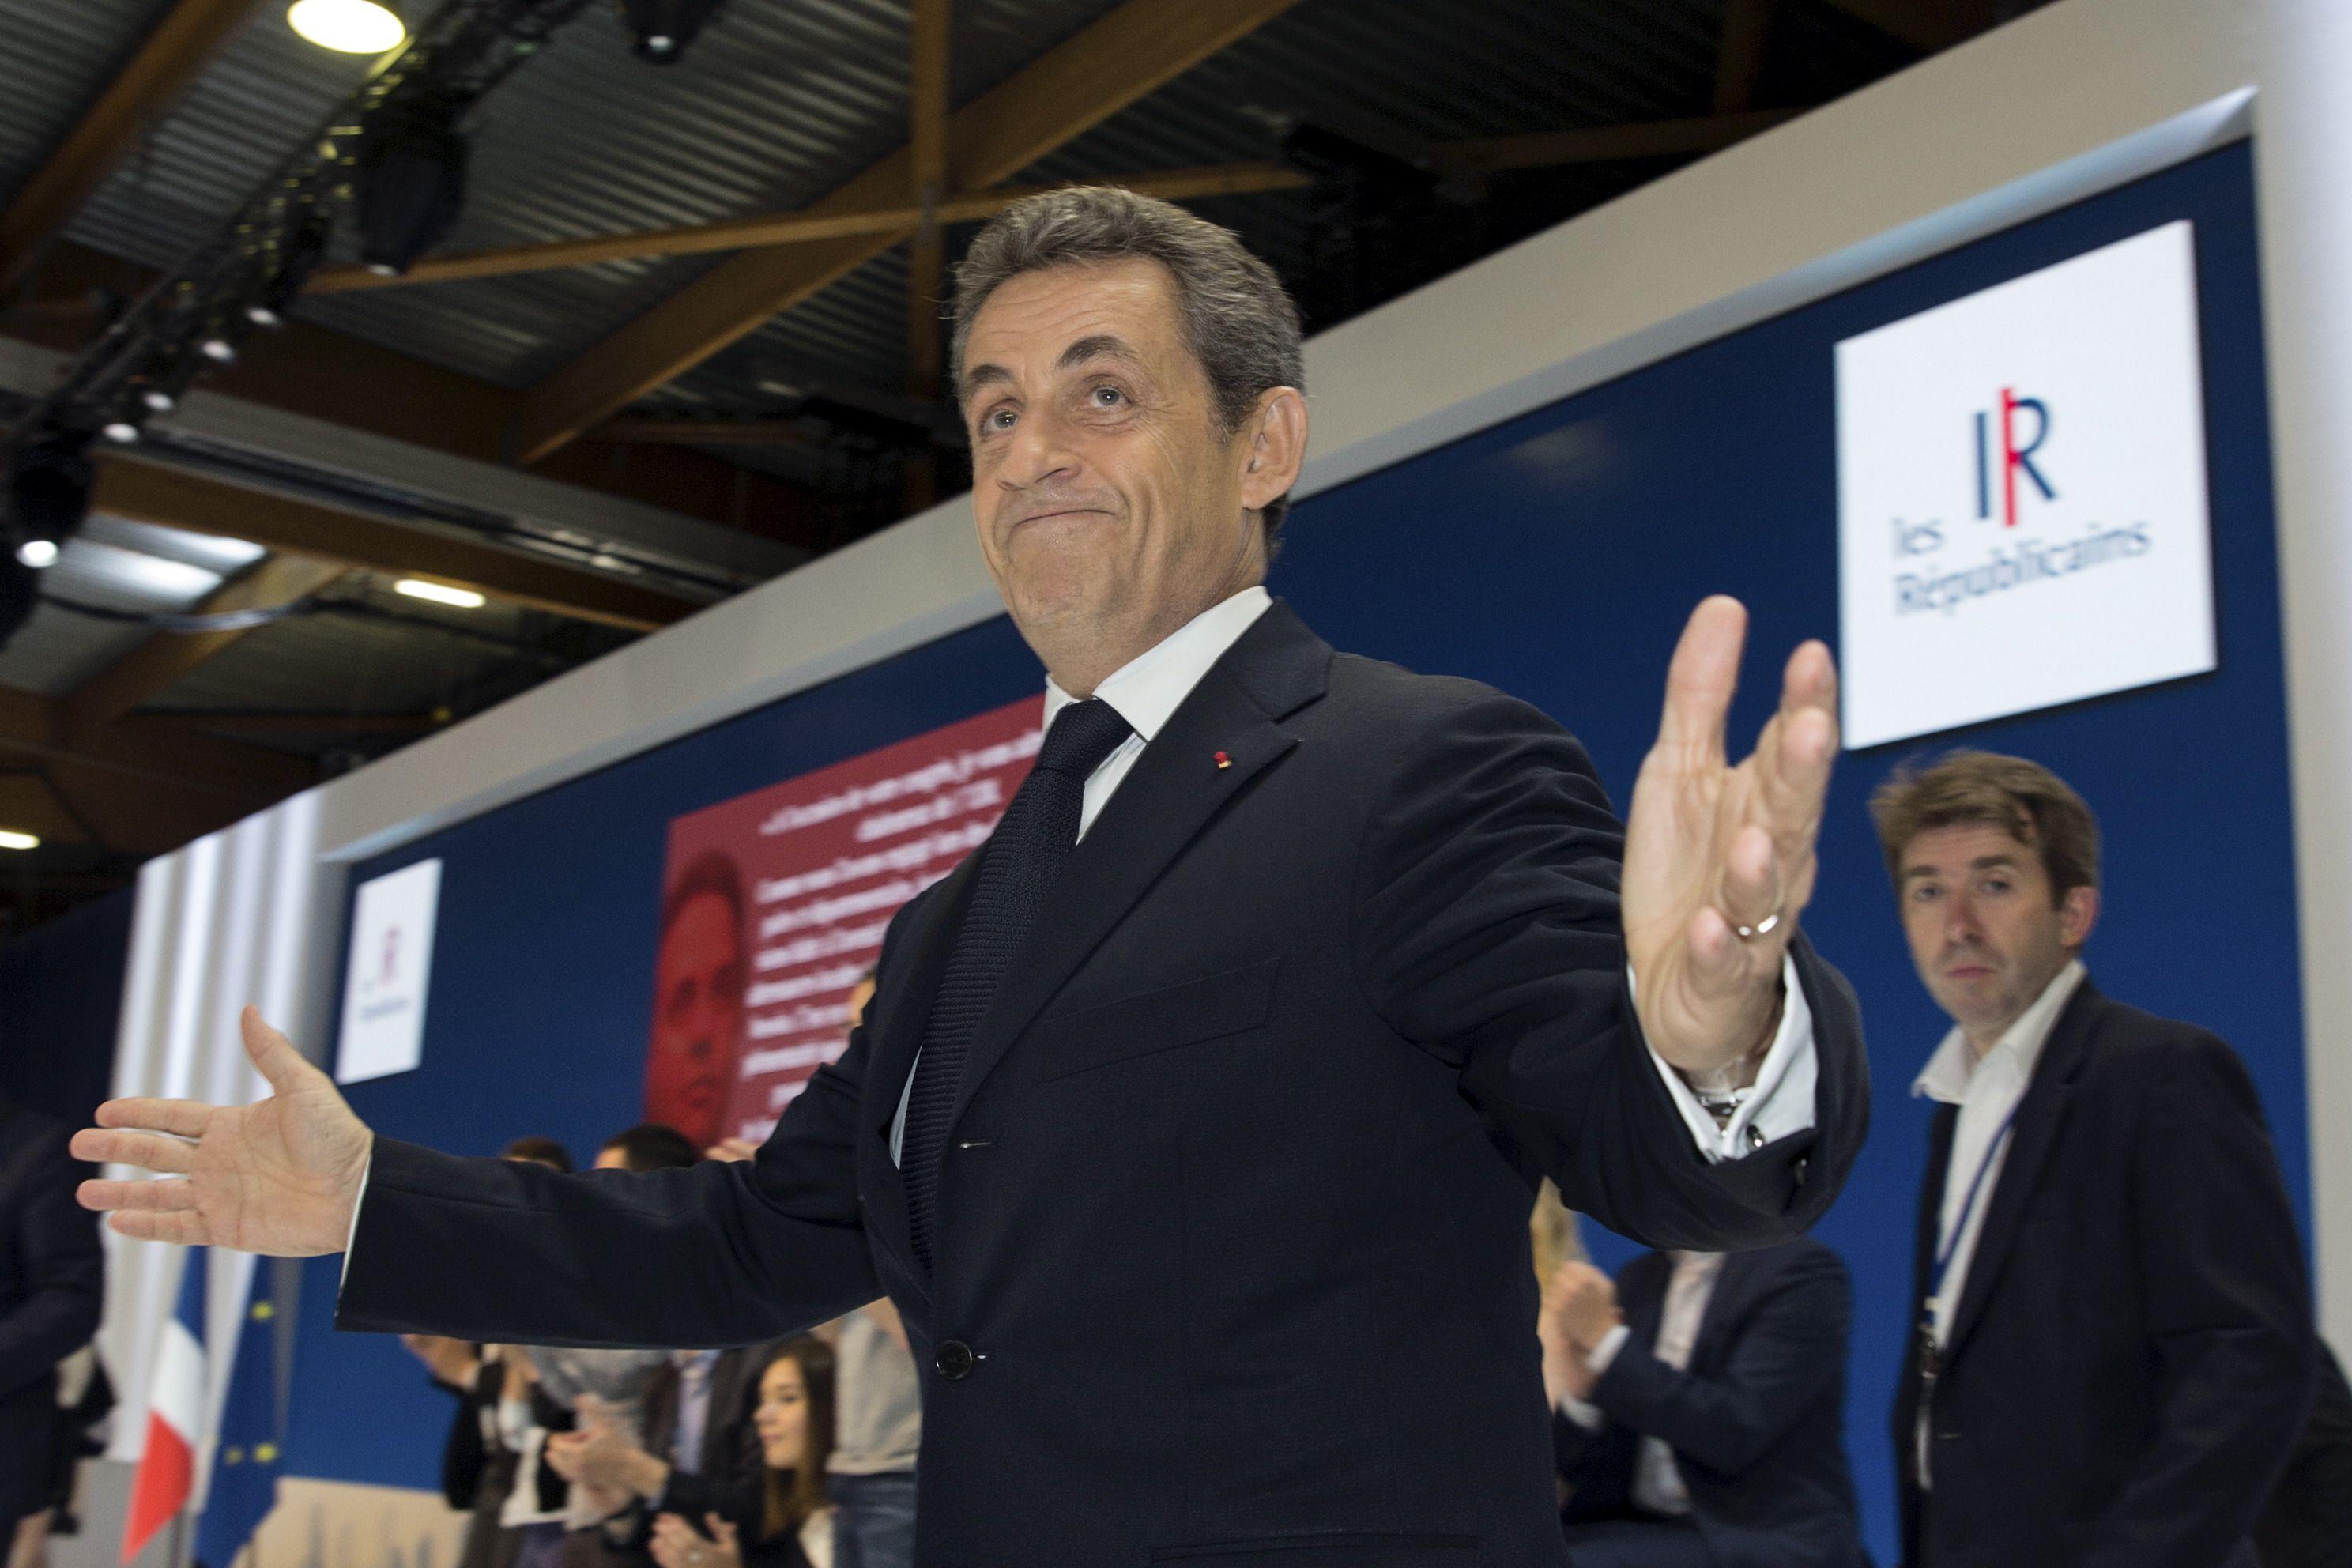 Primaire 2016: Nicolas Sarkozy devancerait Alain Juppé de justesse